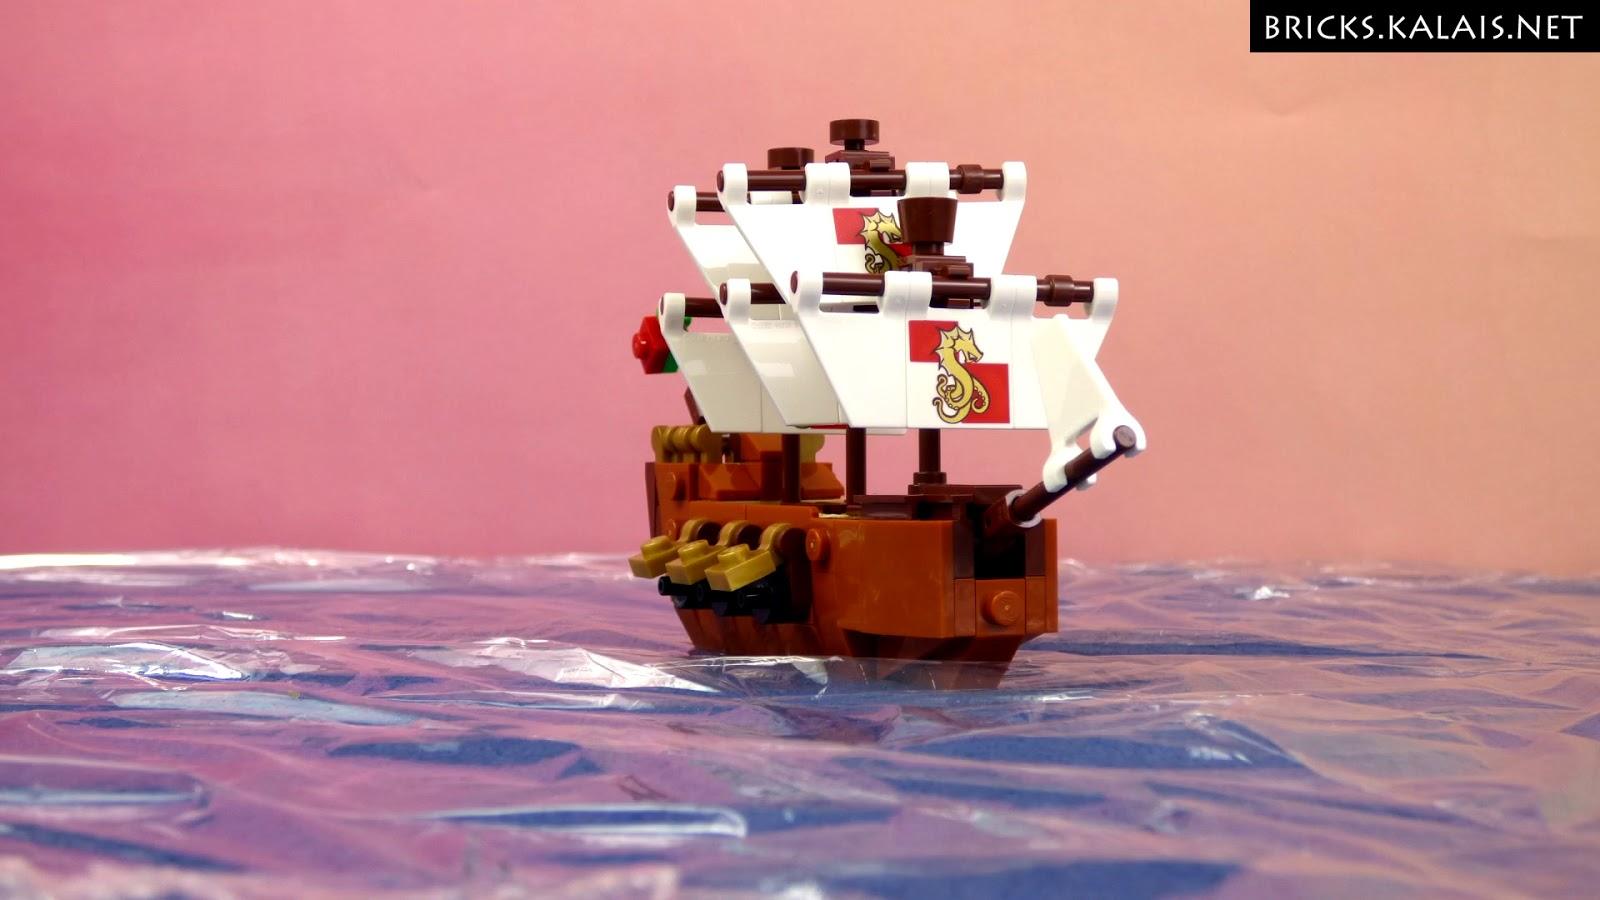 [Brickfilm] Ship in the bottle 21313